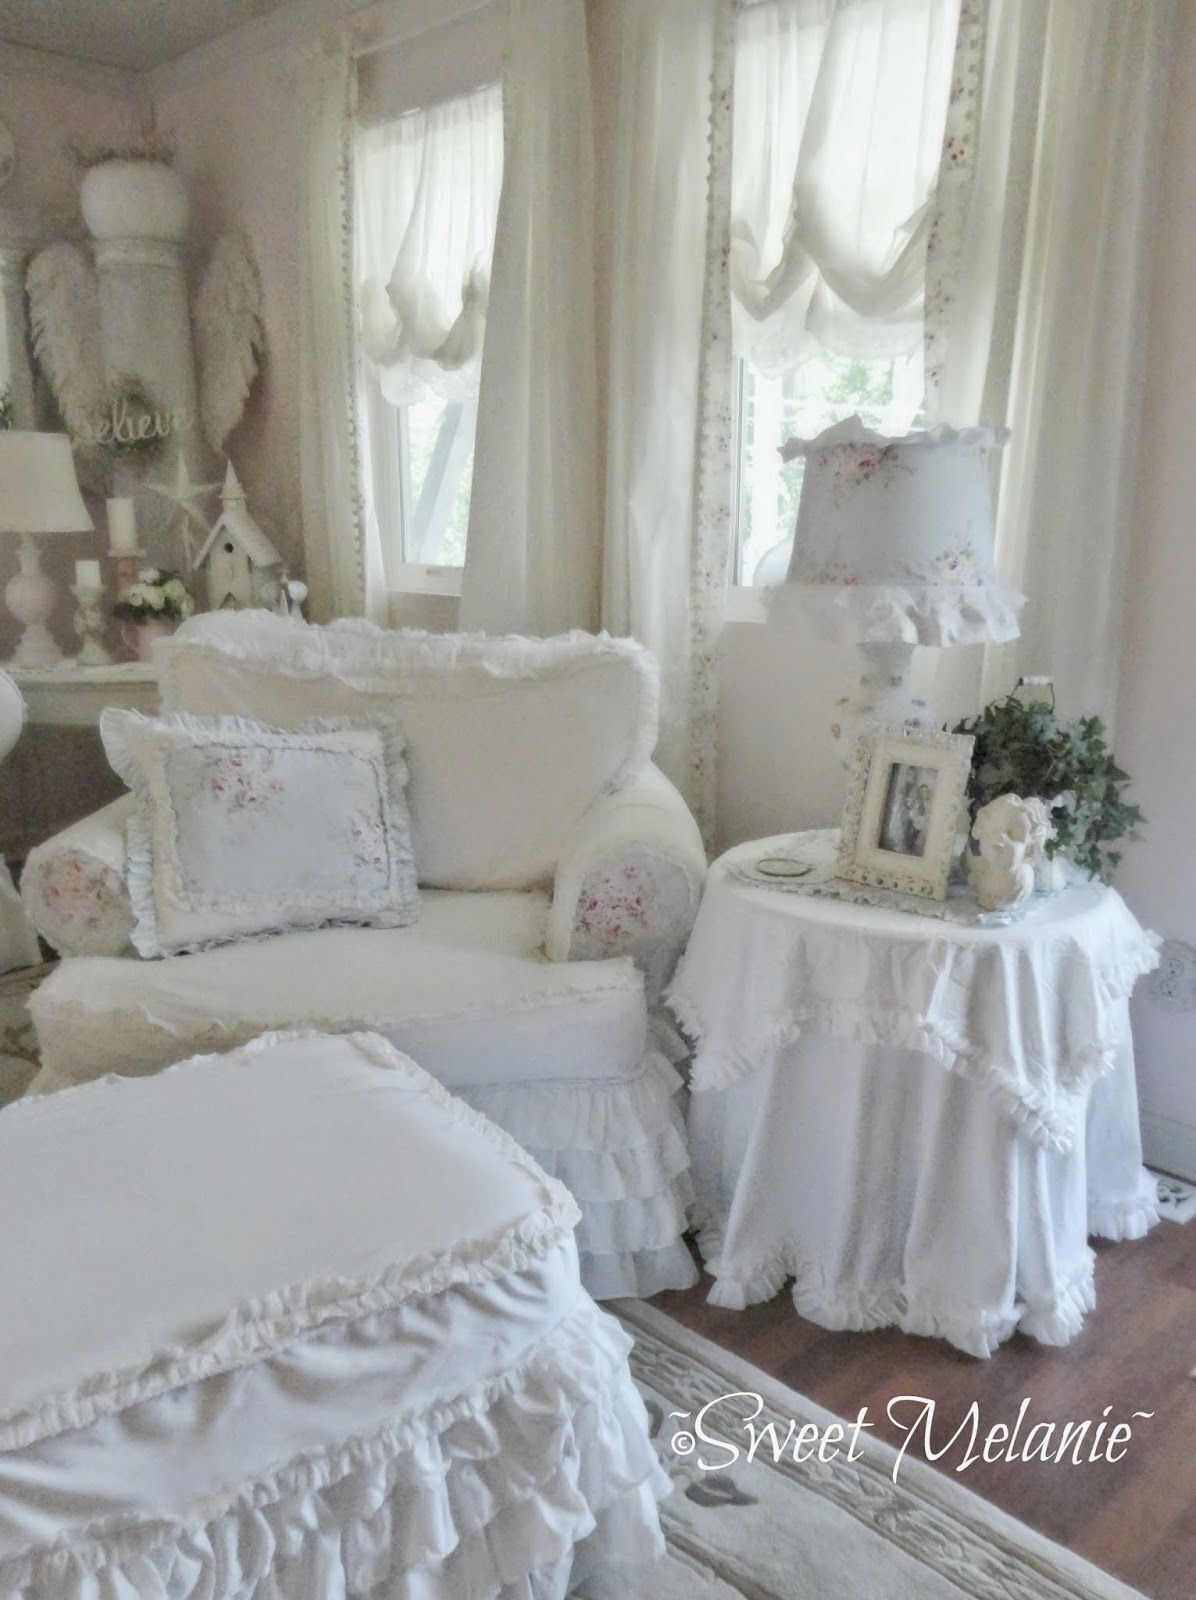 sweet melanie shabby ideas pinterest shabby. Black Bedroom Furniture Sets. Home Design Ideas